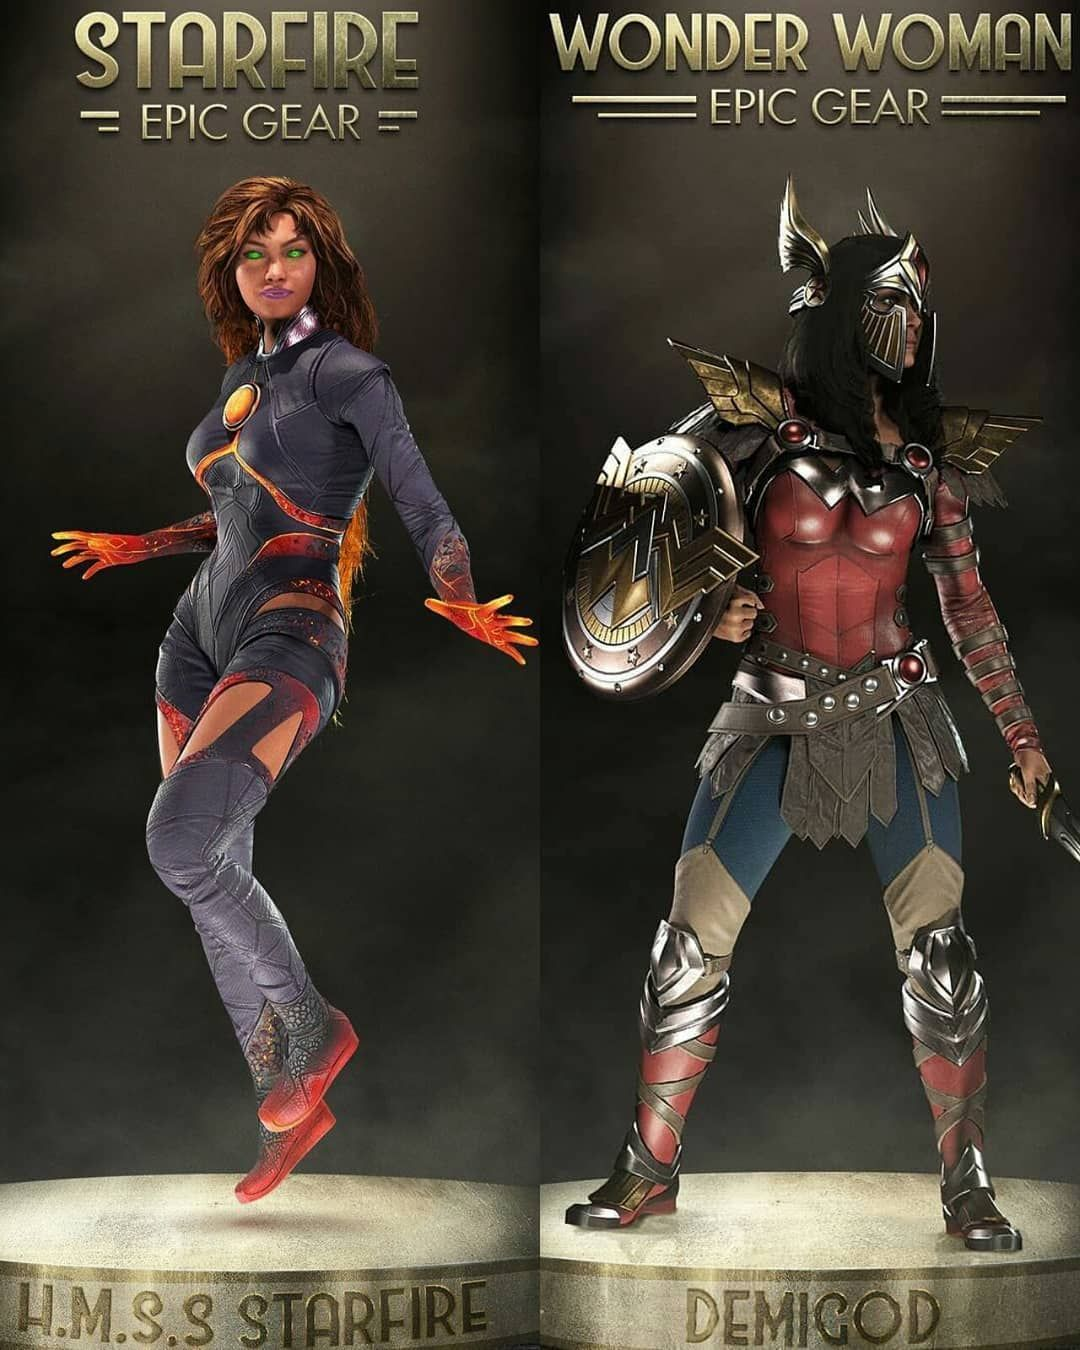 Starfire And Wonder Woman Injustice 2 Starfire Wonderwoman Koriandr Koryanders Kori Kory Themyscira Tamaran Star Wonder Woman Starfire Cosplay Woman